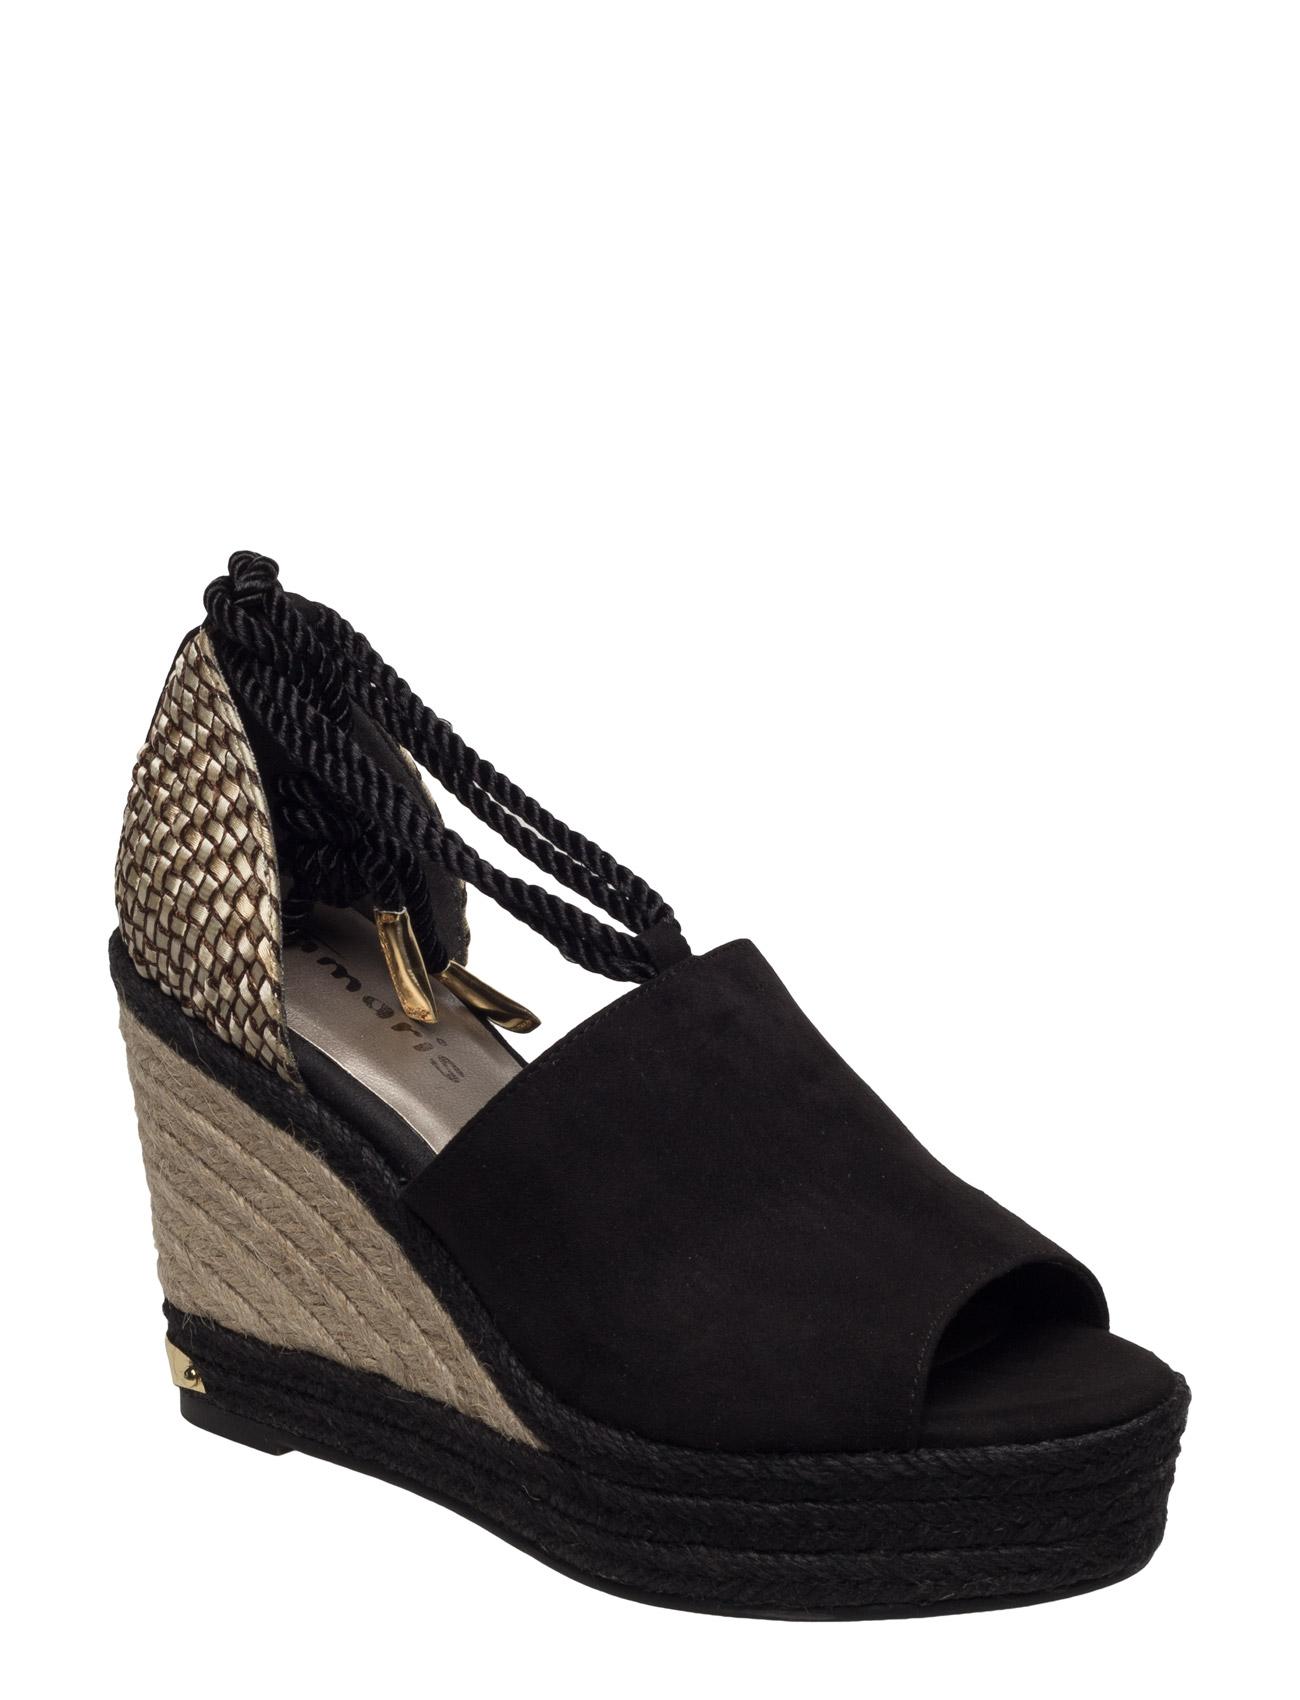 Woms Sandals - Nara Tamaris Espadrillos til Damer i